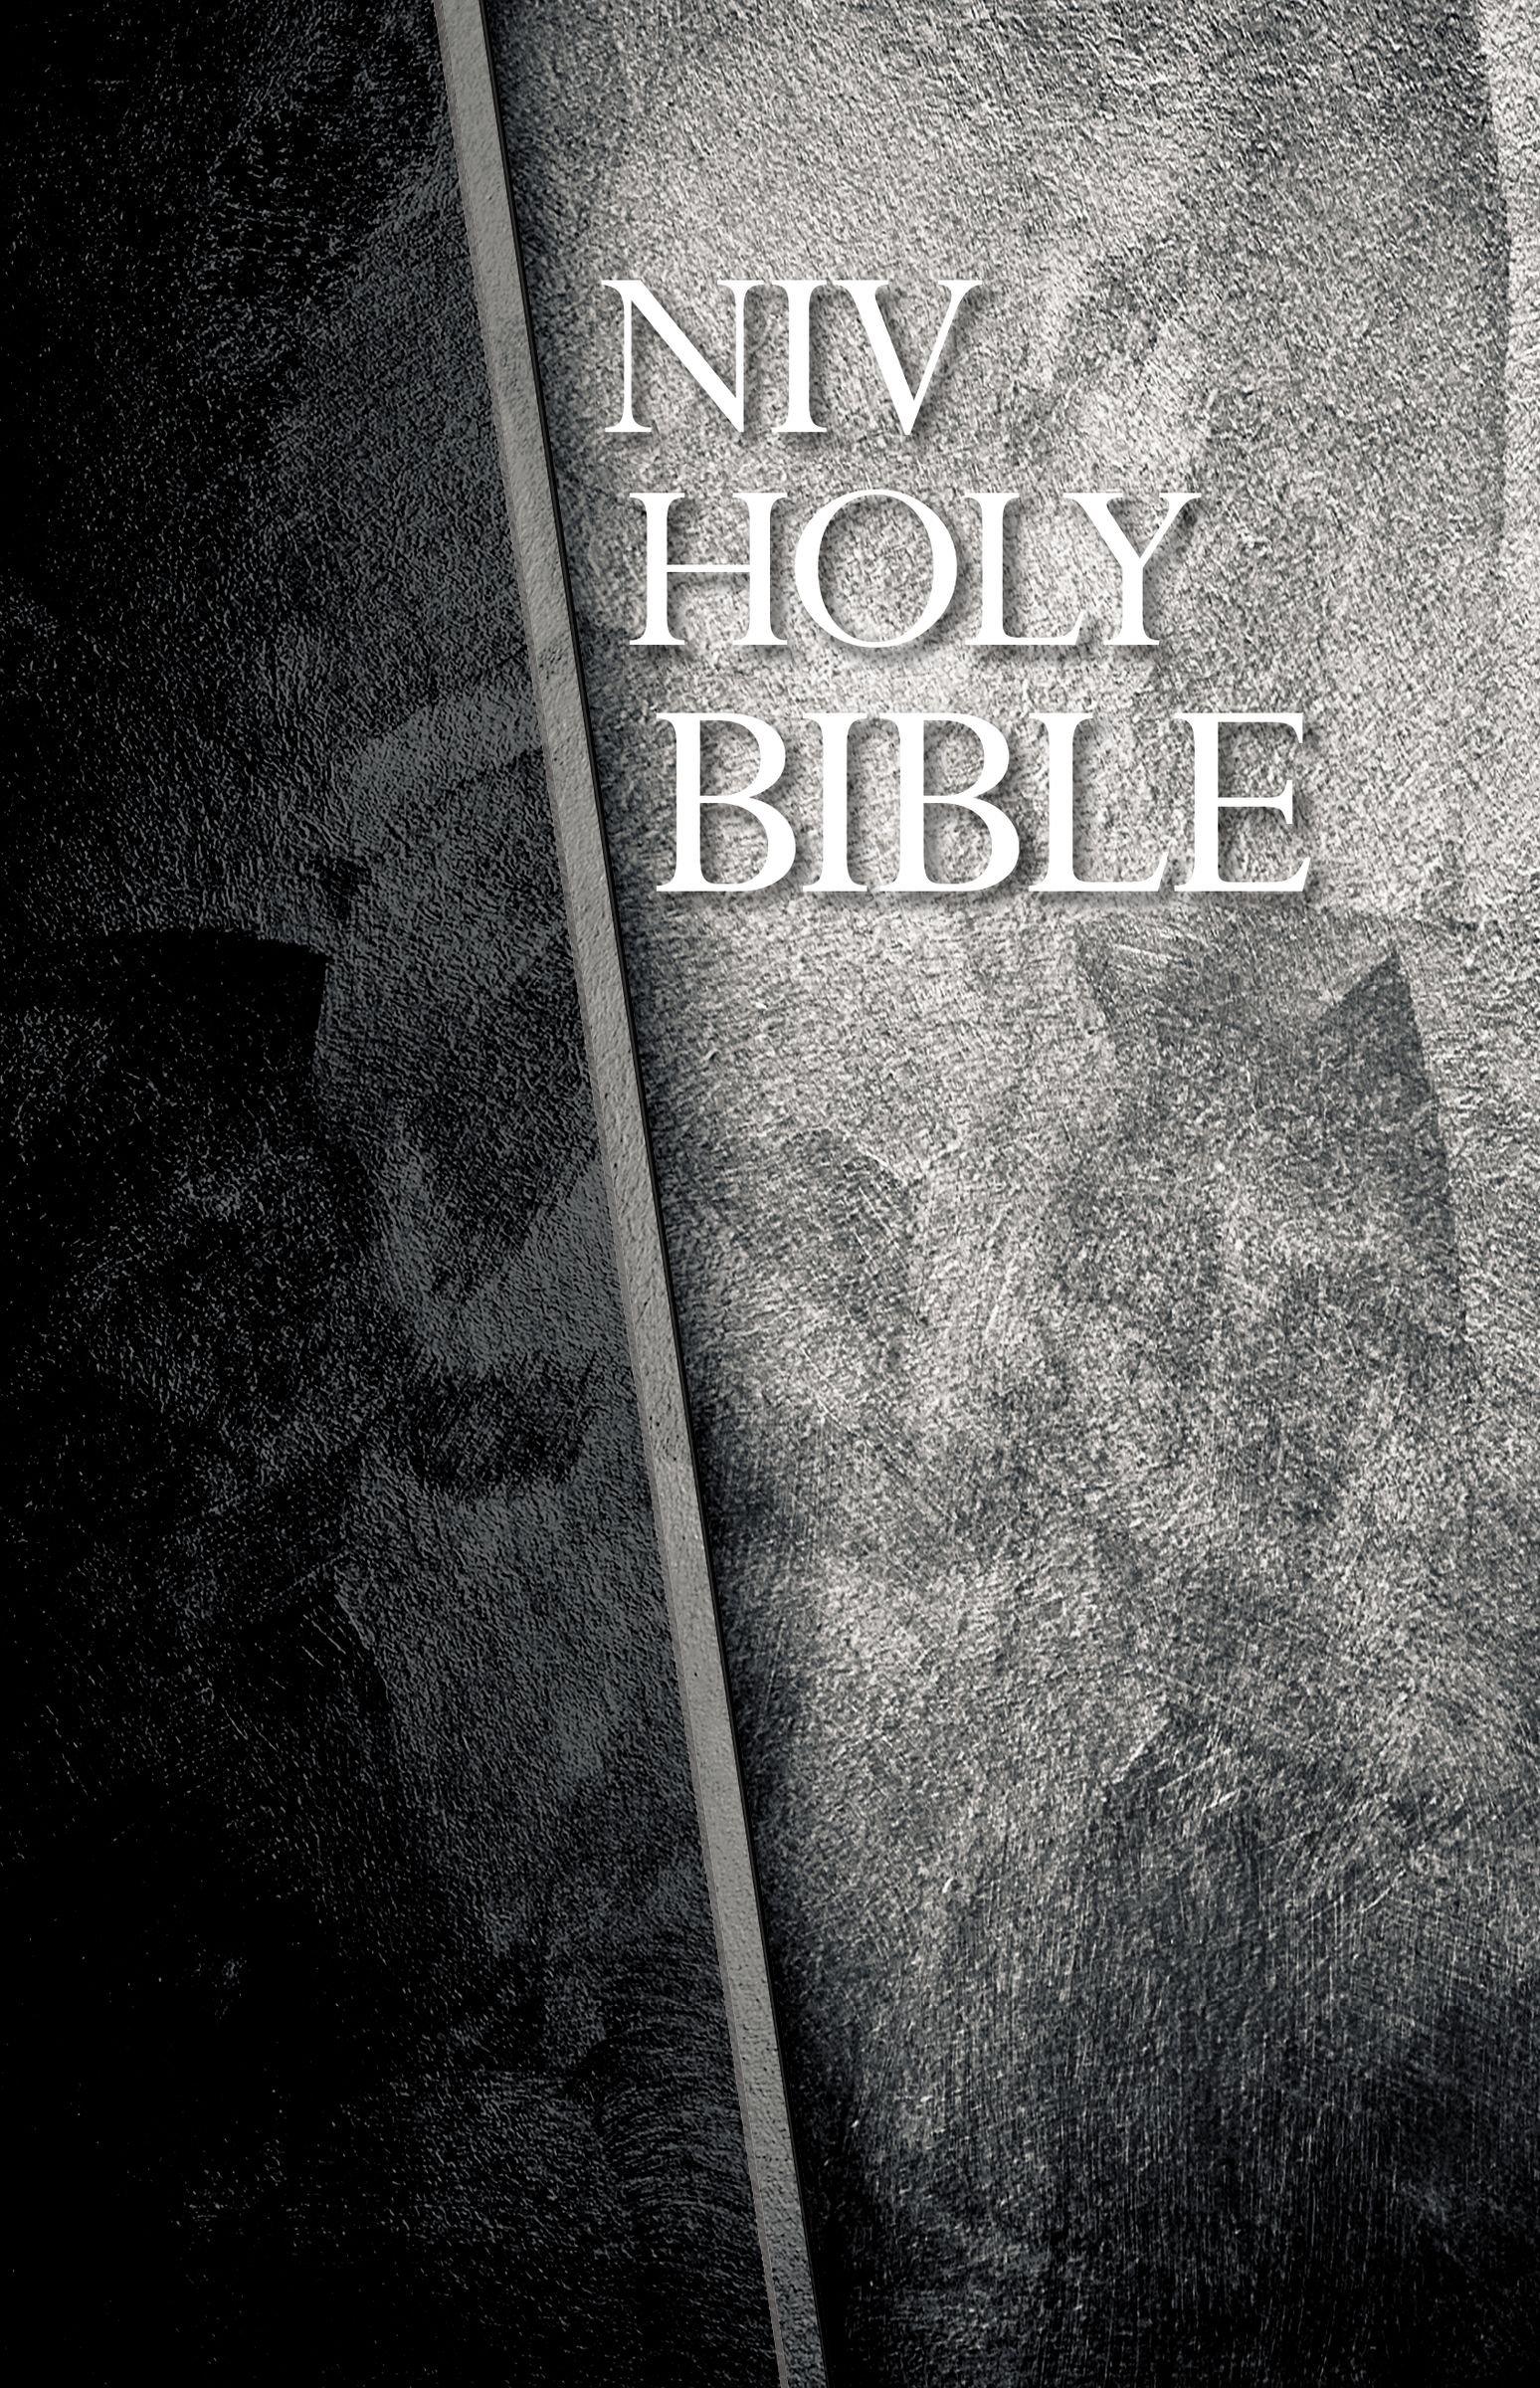 Download NIV, Economy Bible, Hardcover, Black/Gray ePub fb2 ebook